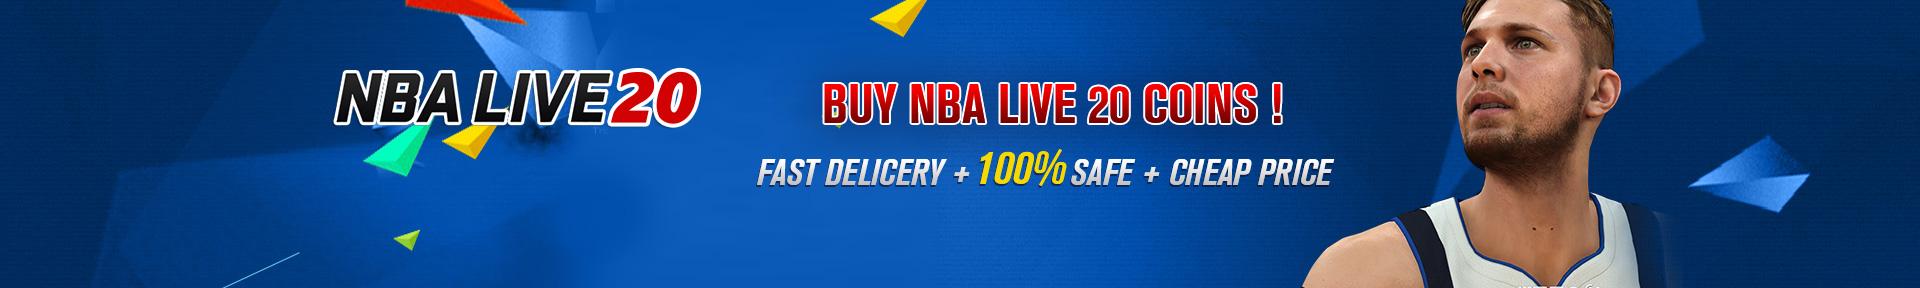 NBA Live 20 Coins